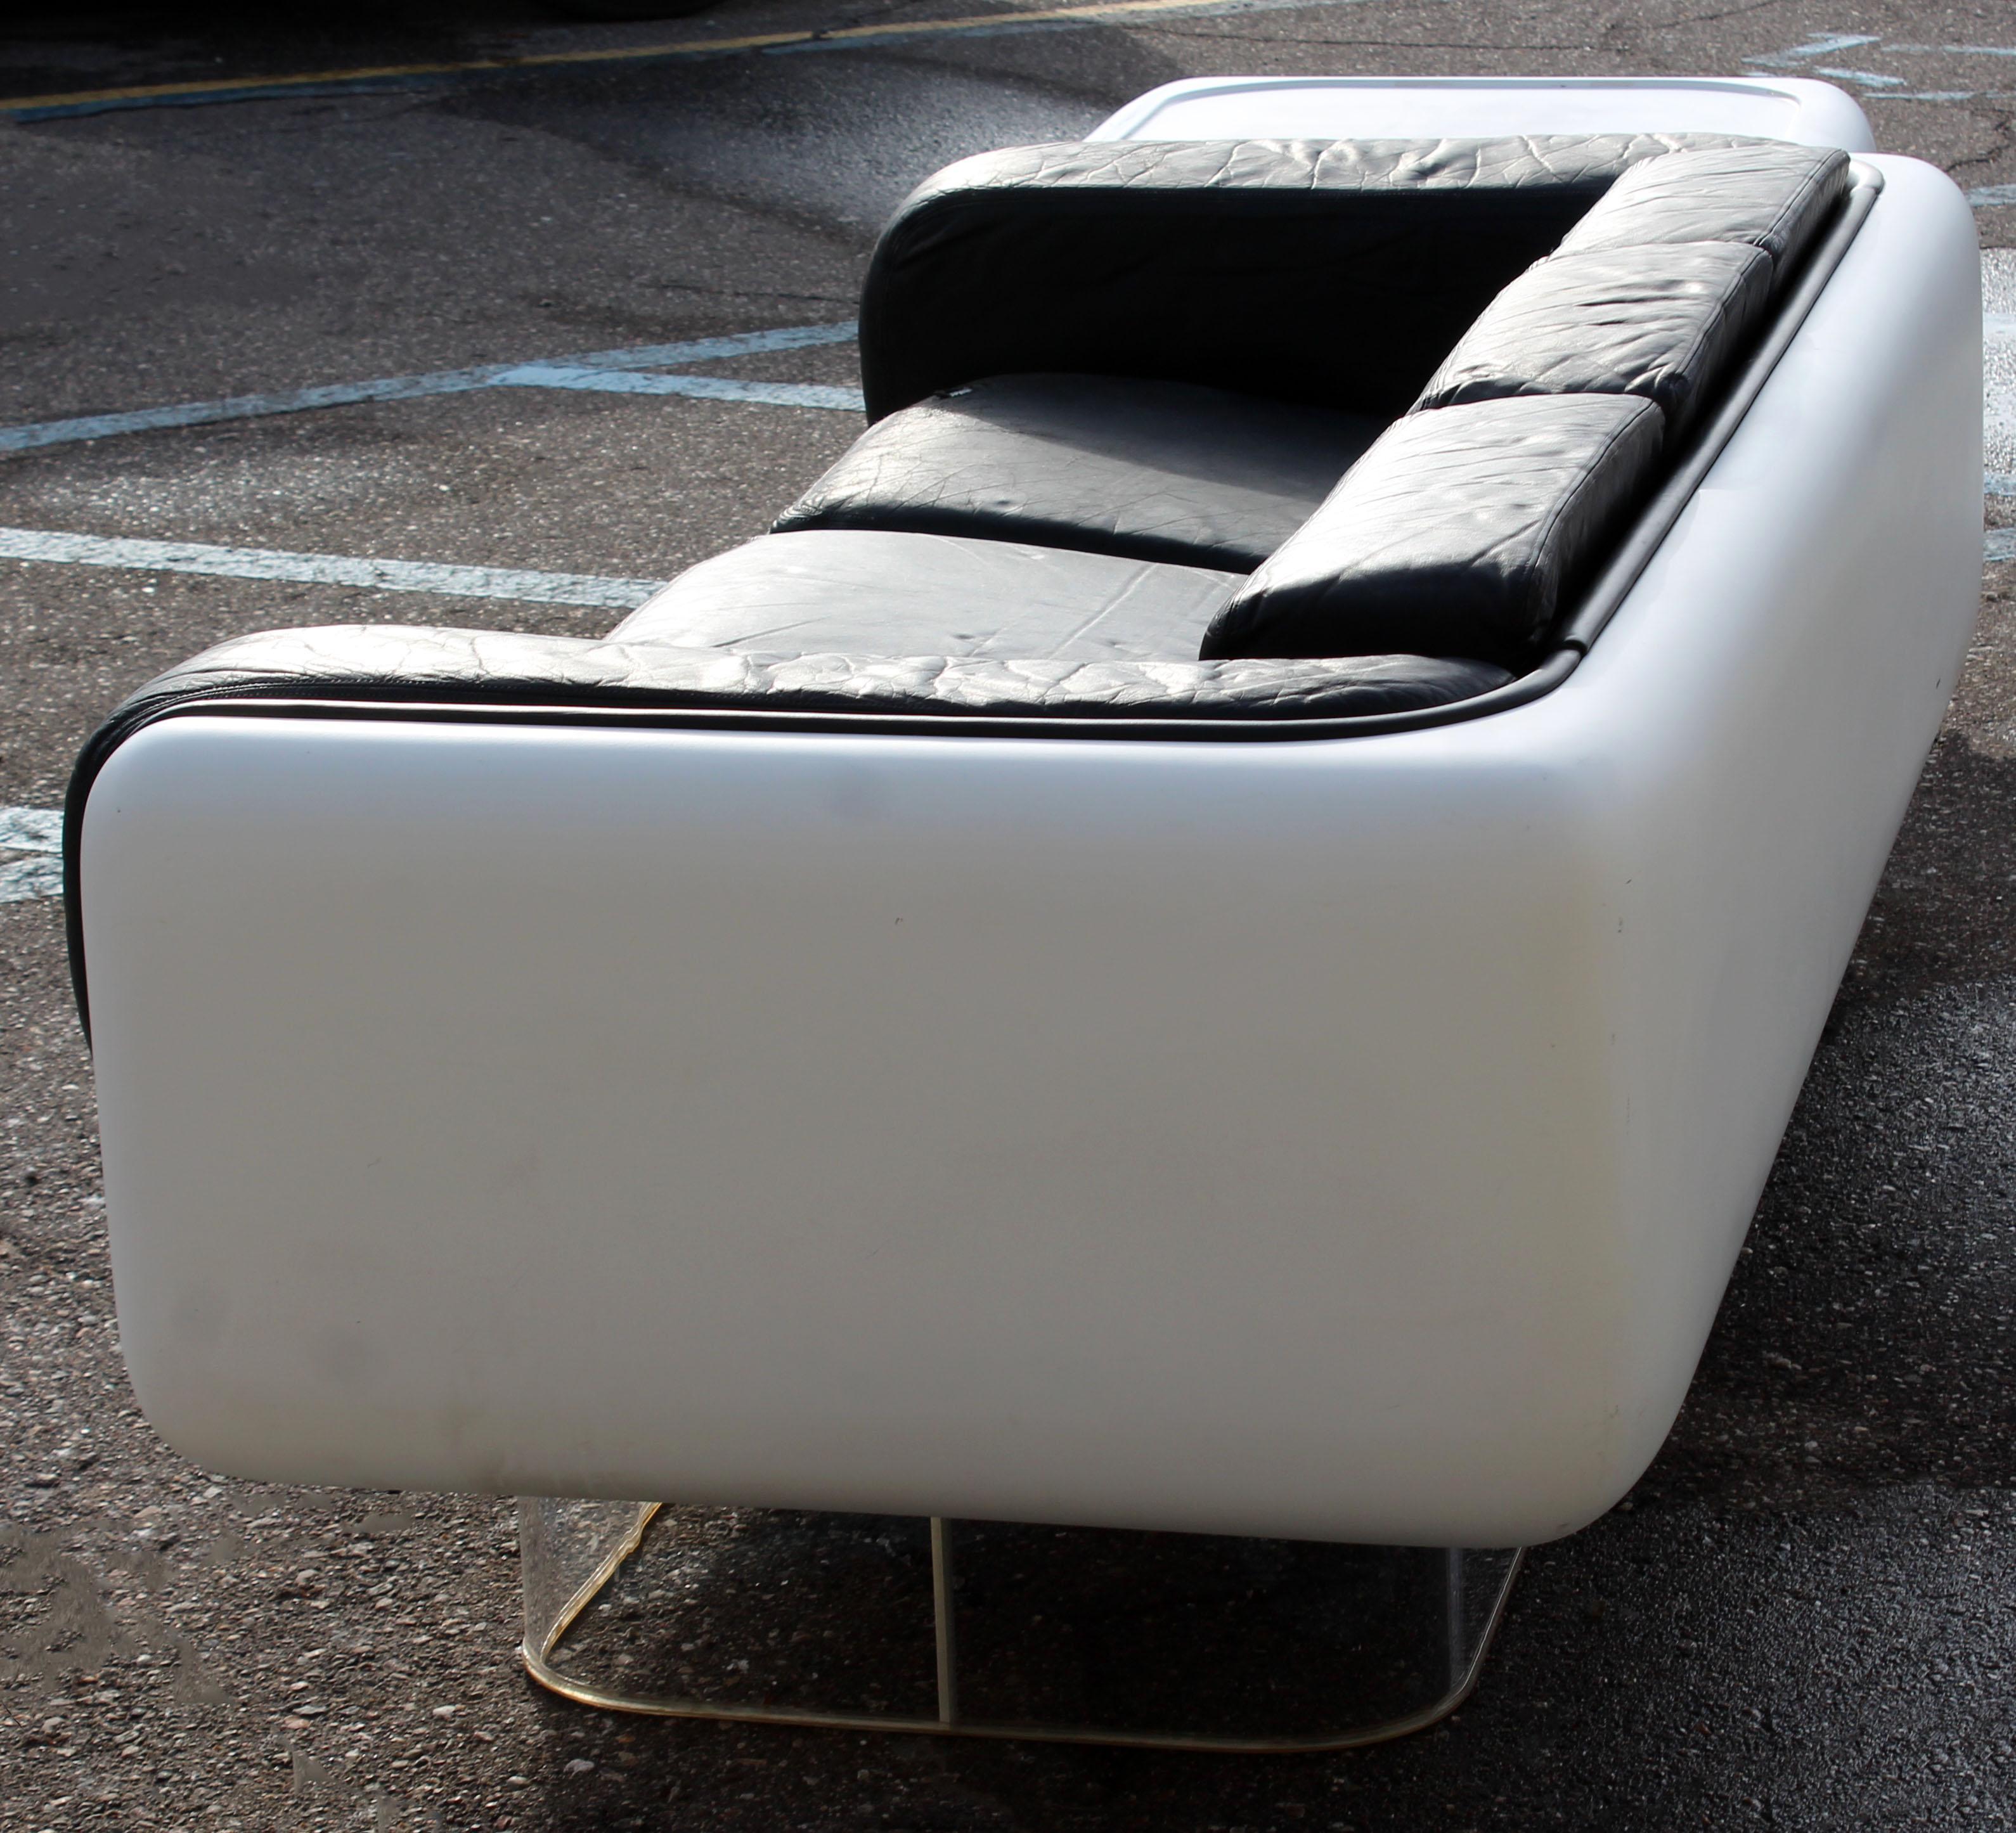 steelcase sofa platner kasala sydney luxury mid century modern warren fiberglass lucite end table for sale in detroit